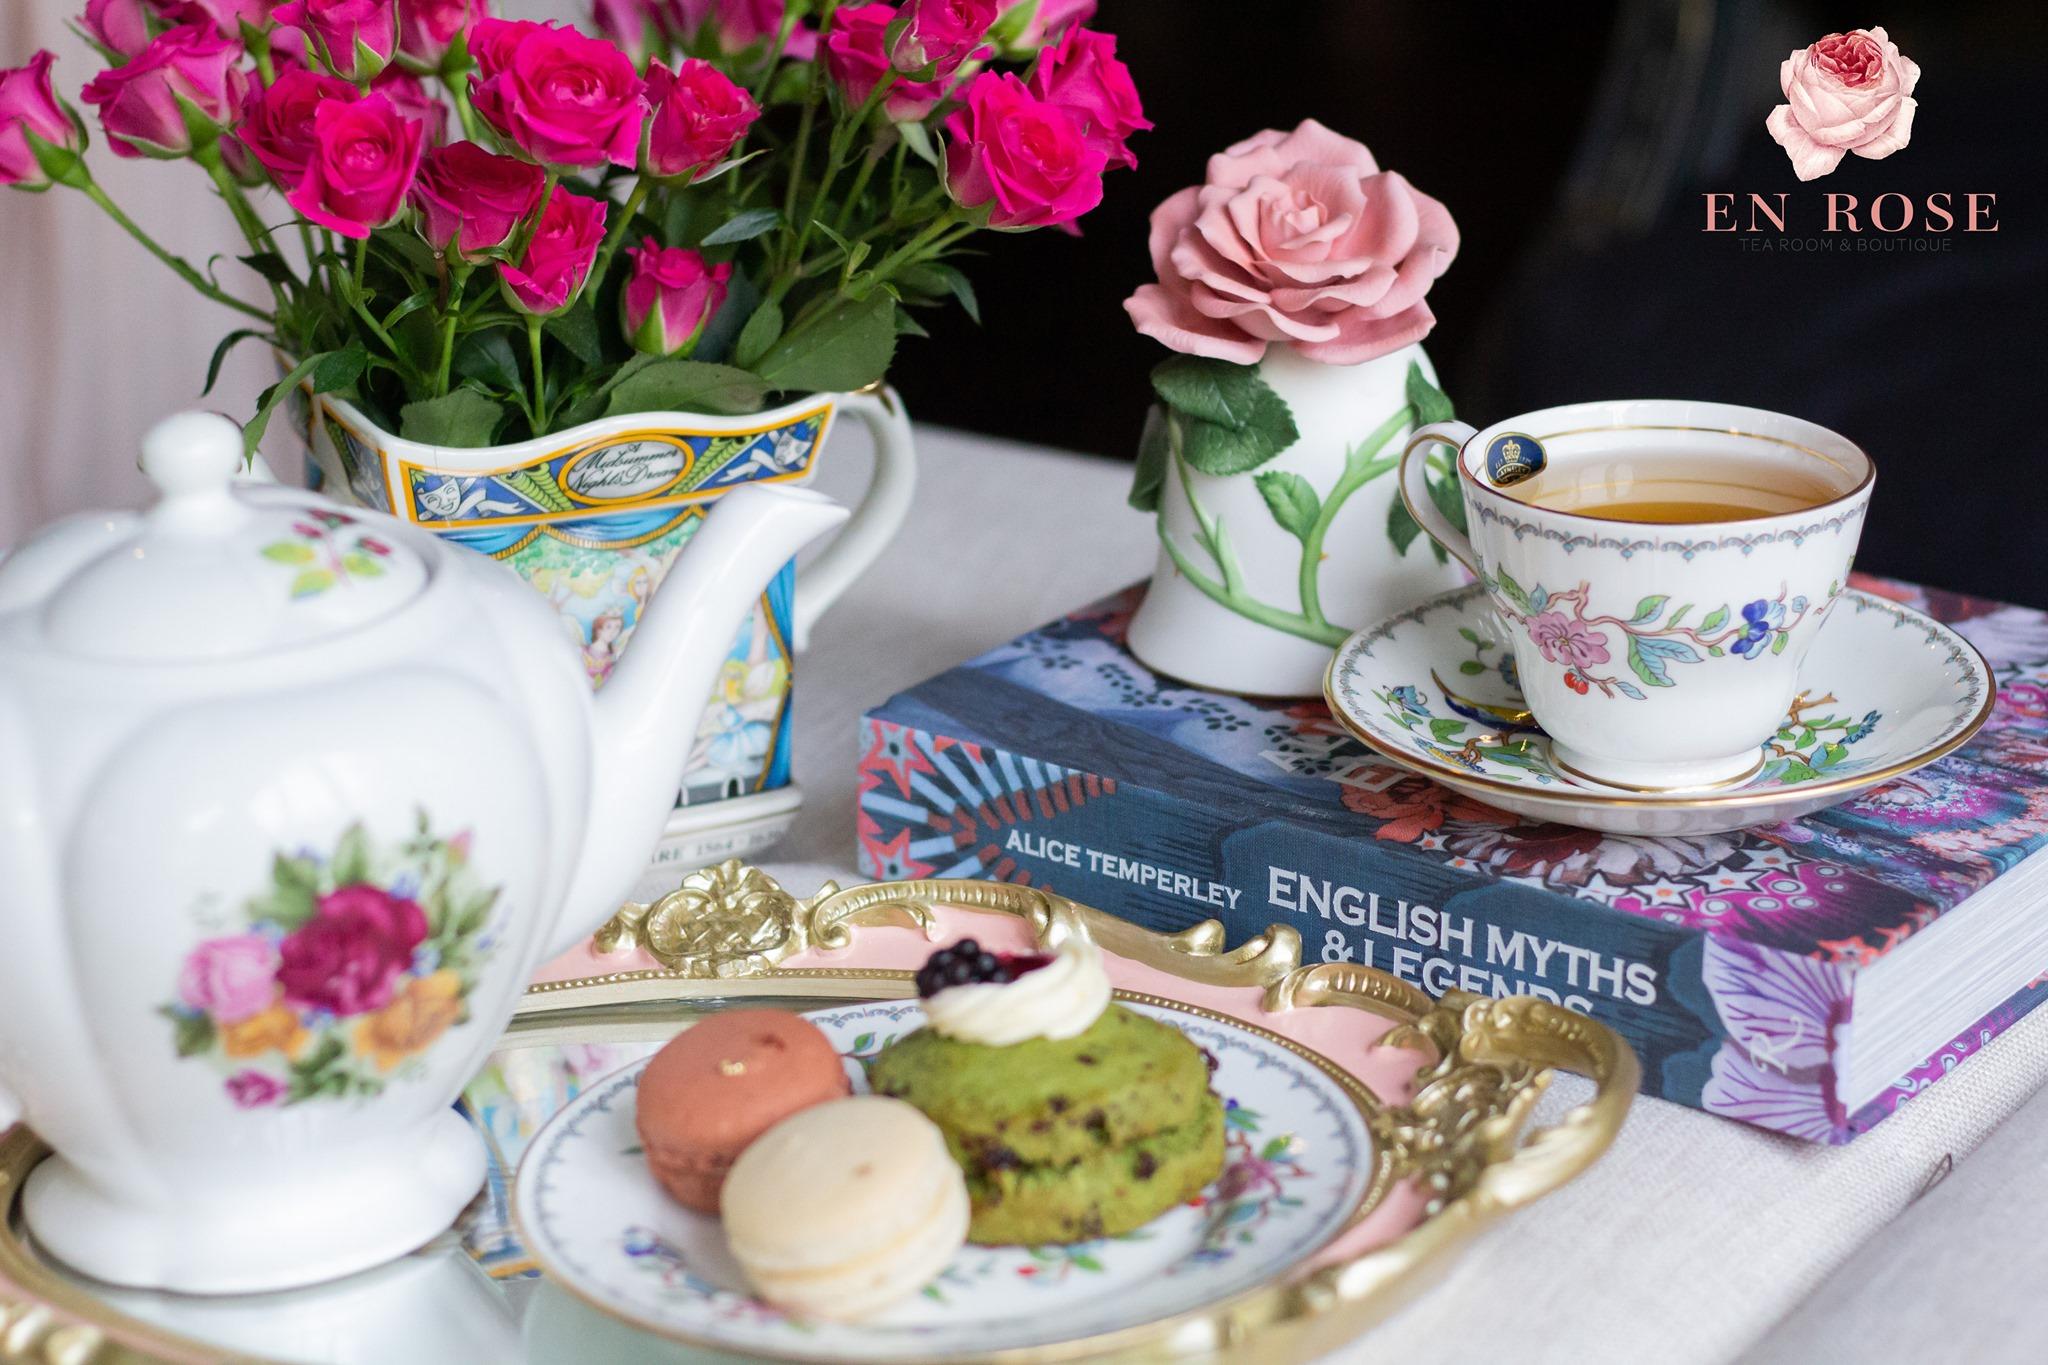 En Rose tea treats